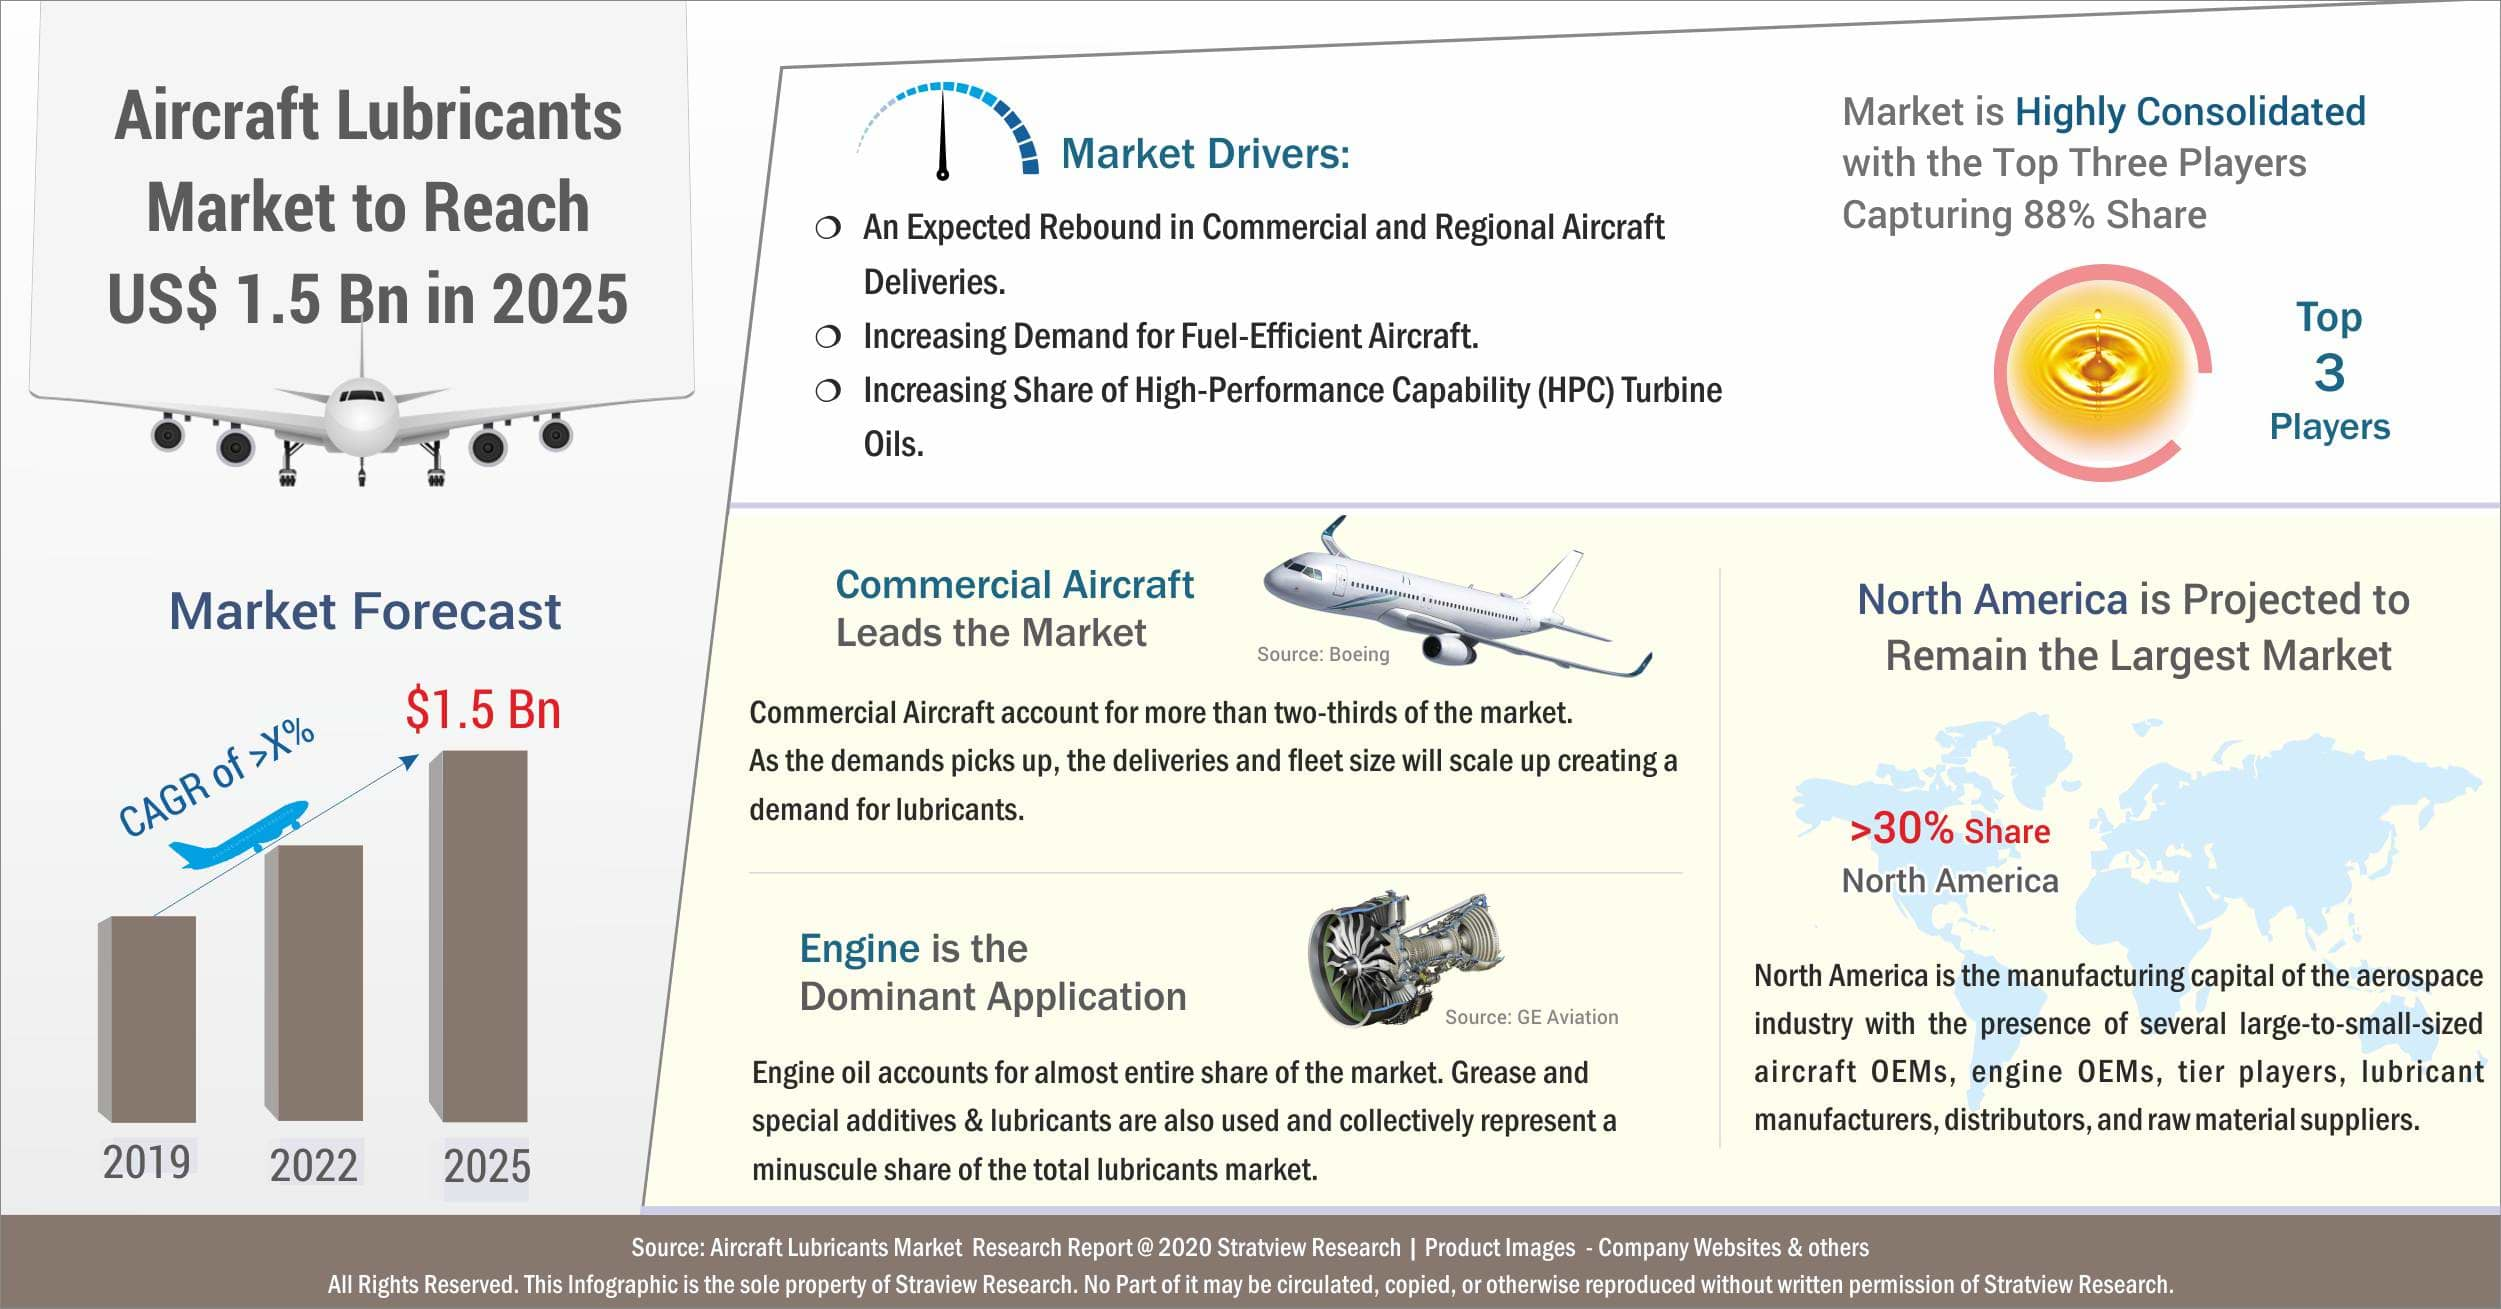 Aircraft Lubricants Market Analysis